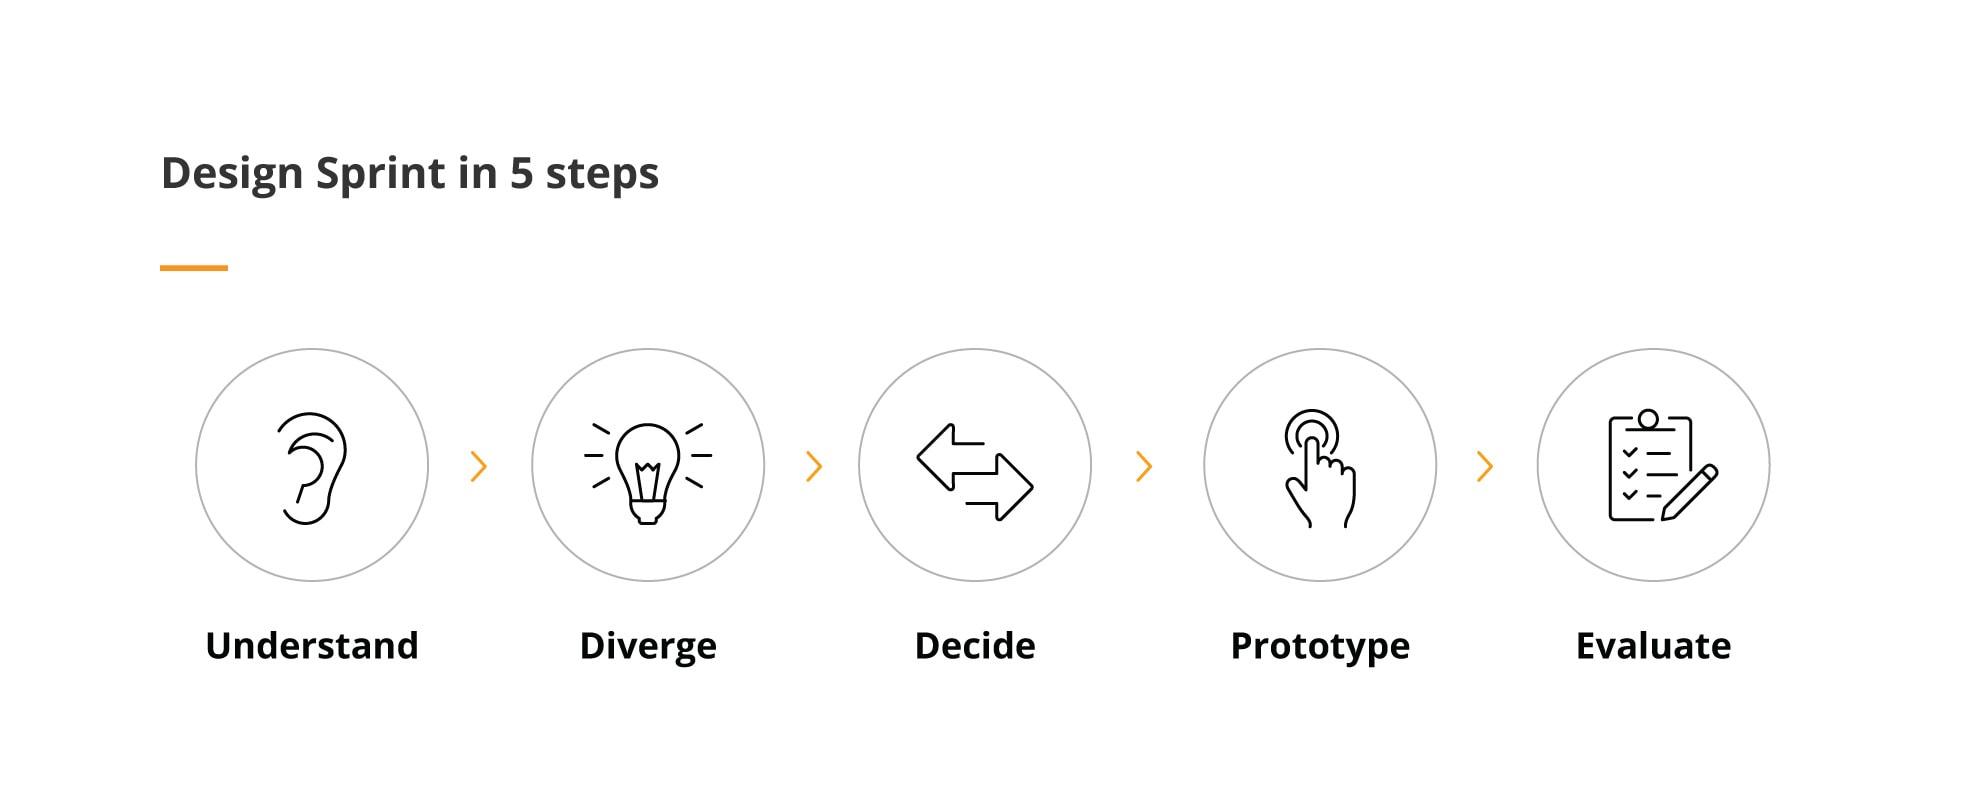 Design Sprint 5 steps